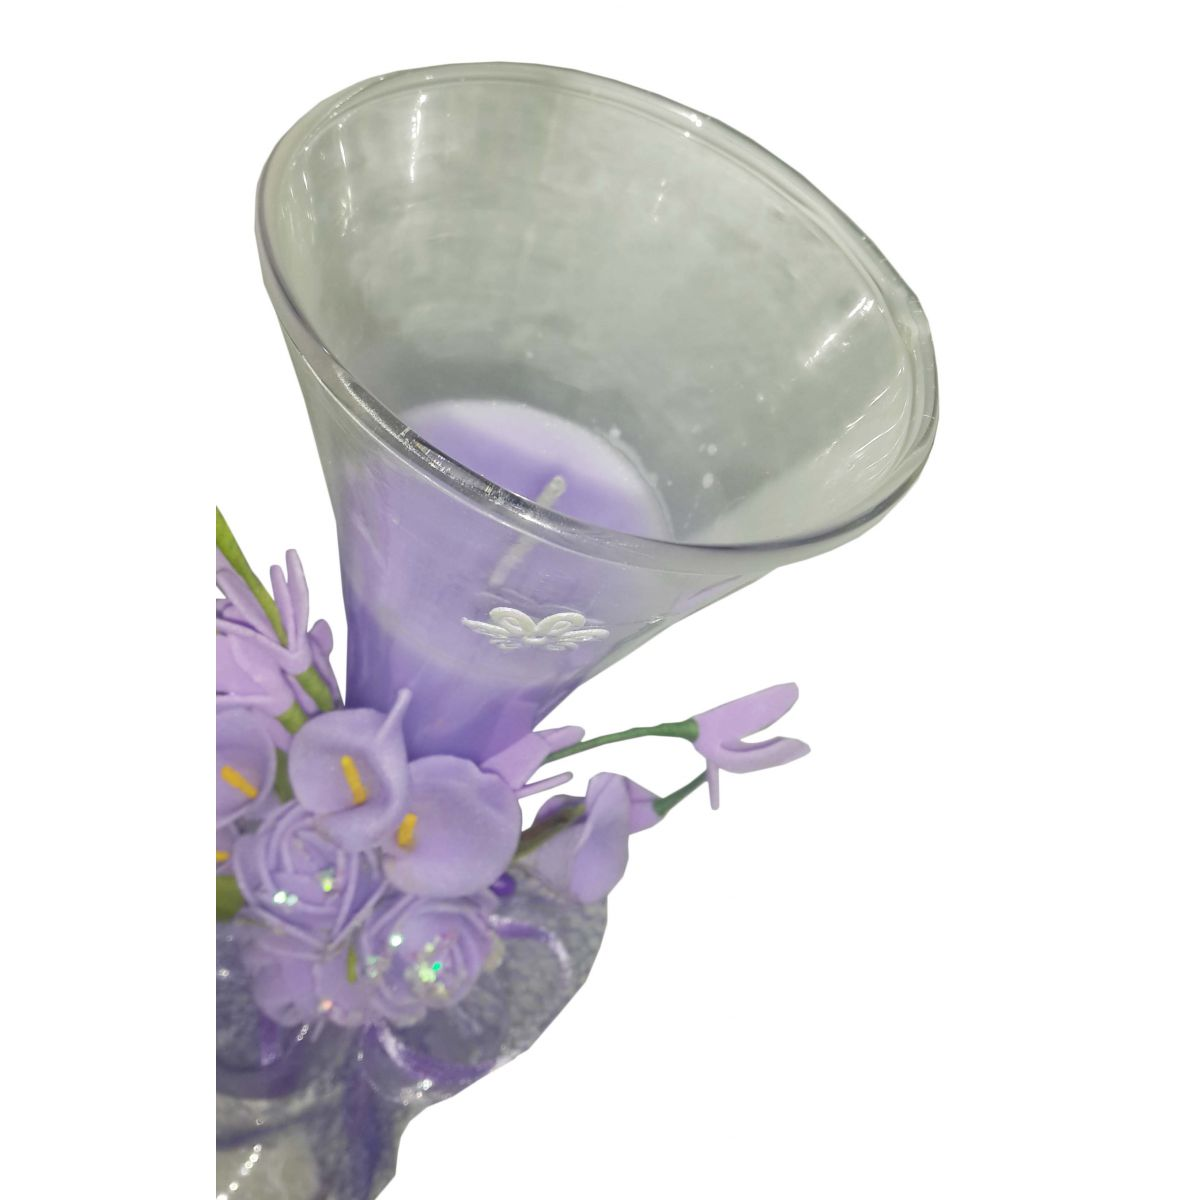 Vela Parafina Perfumada Decorativa Grande Fragrancia Flores Lilas (WL-A)